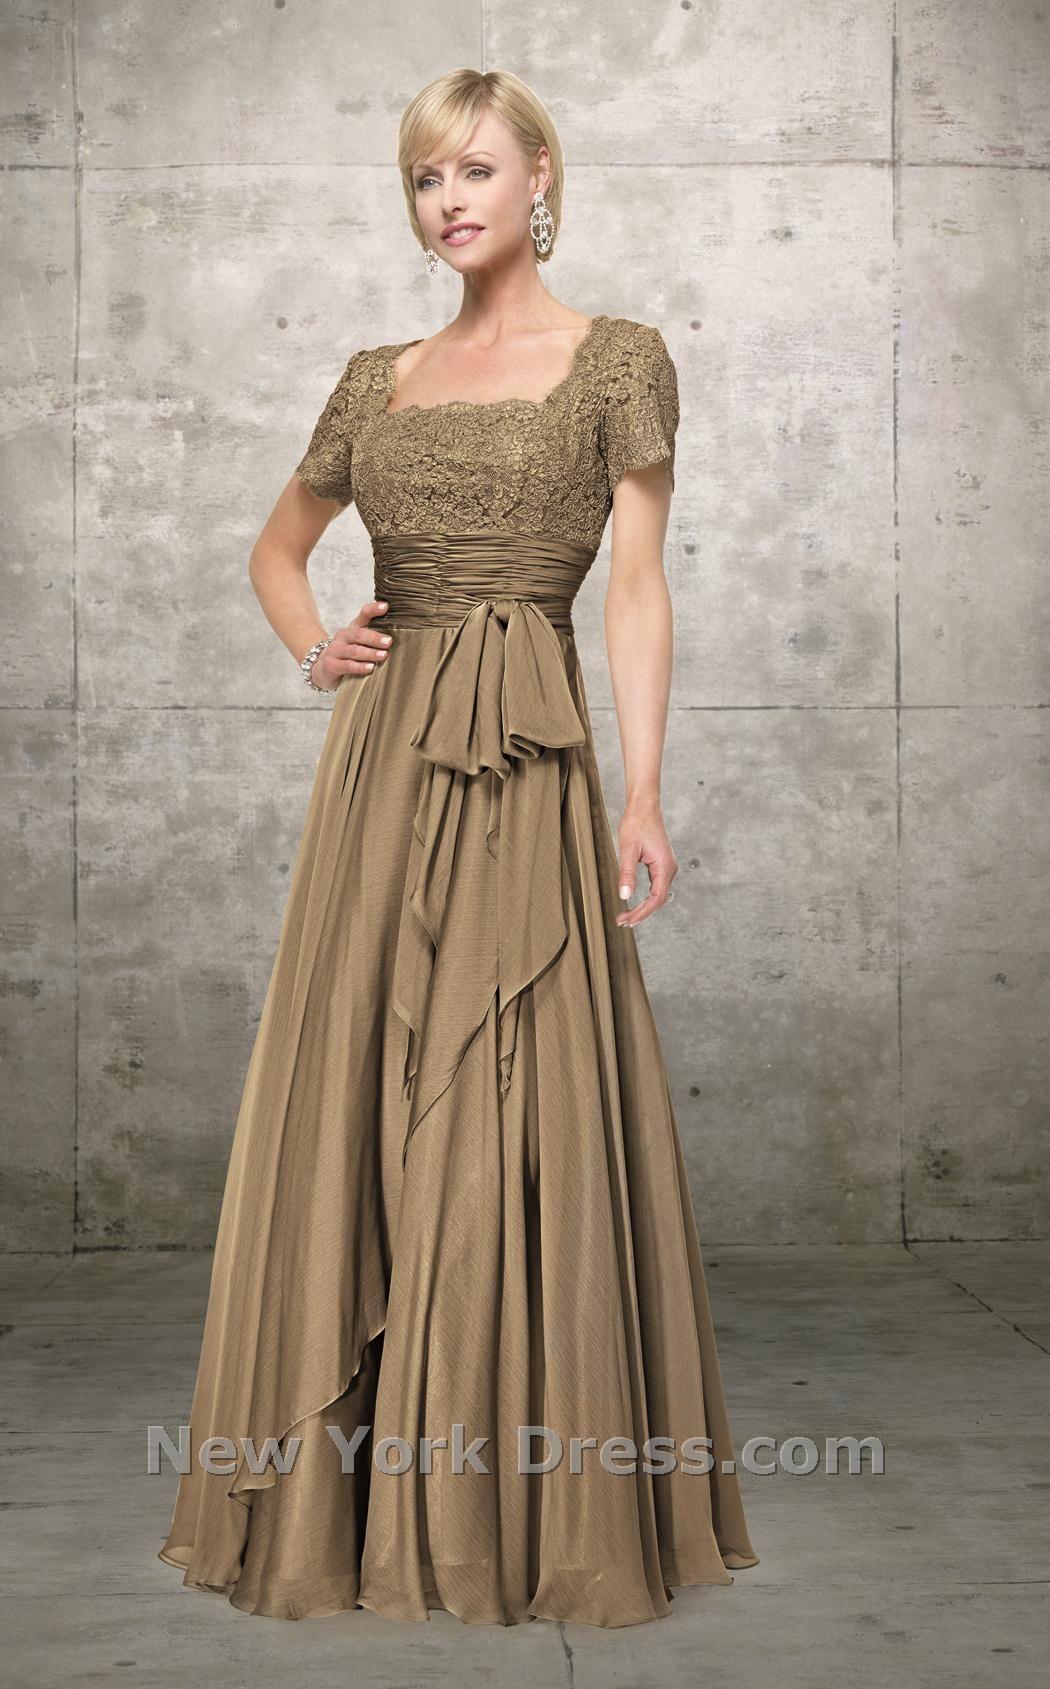 Alyce beige bride dresses and wedding